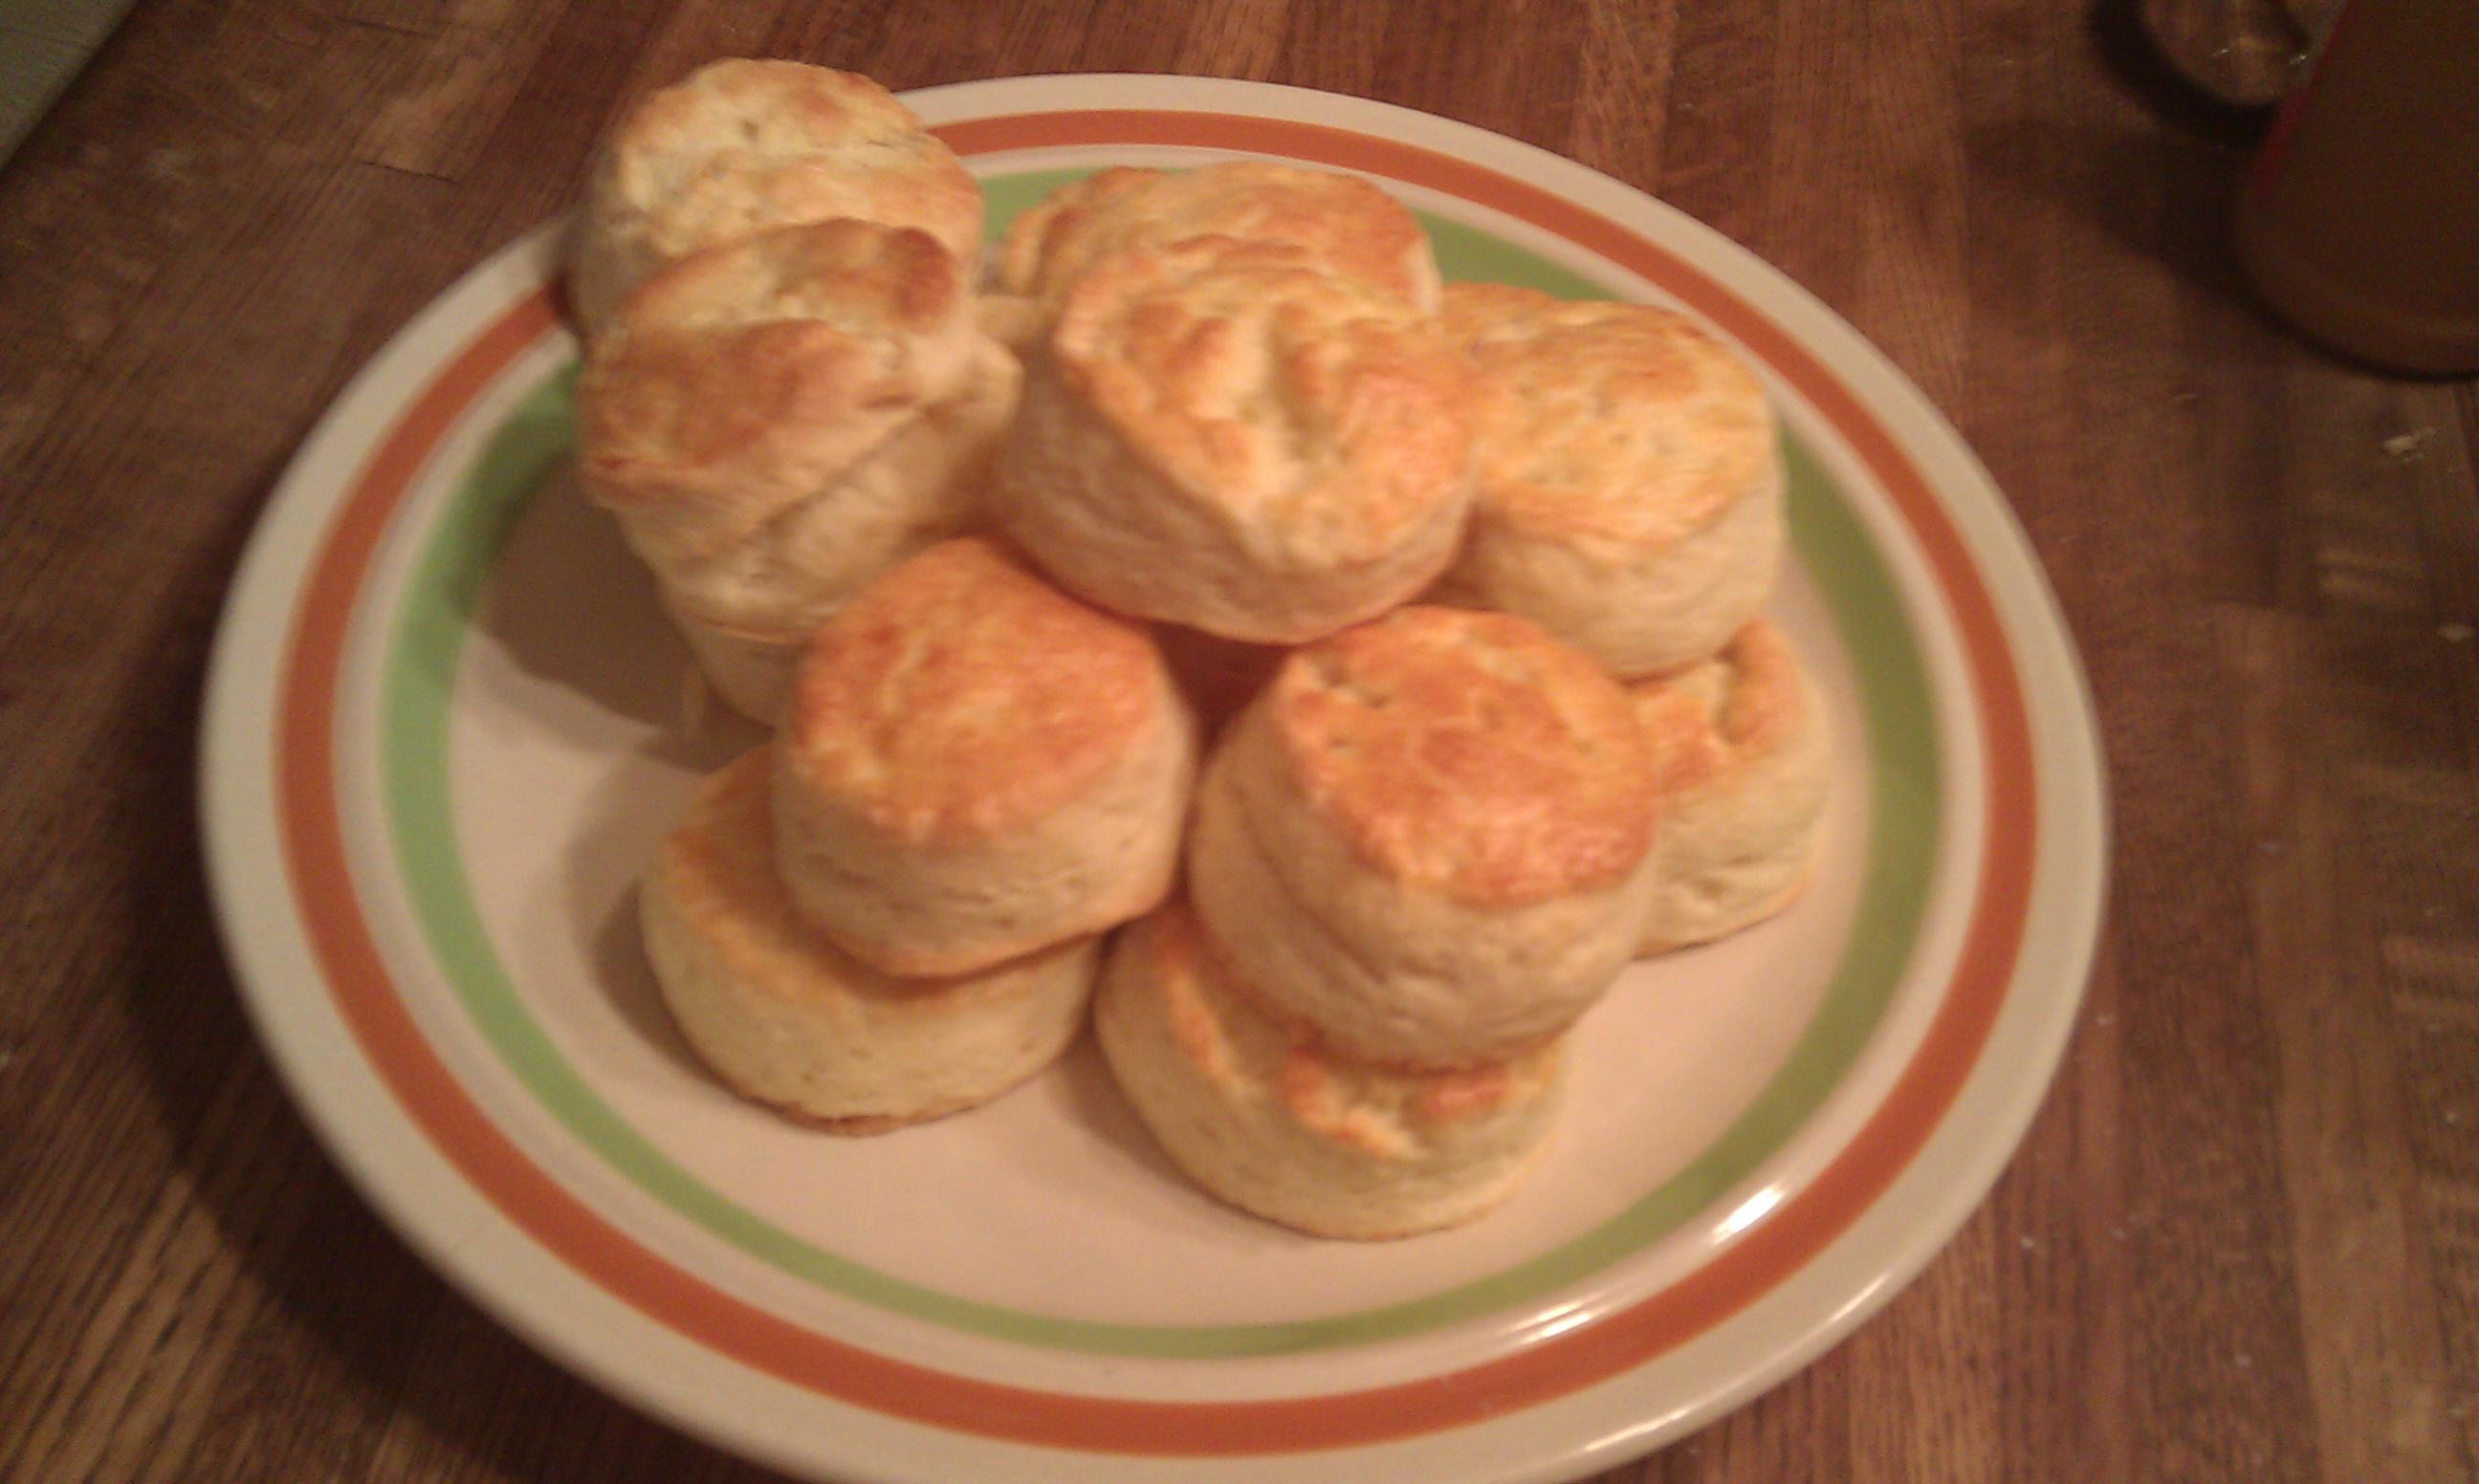 Uber Good Buttermilk Biscuits